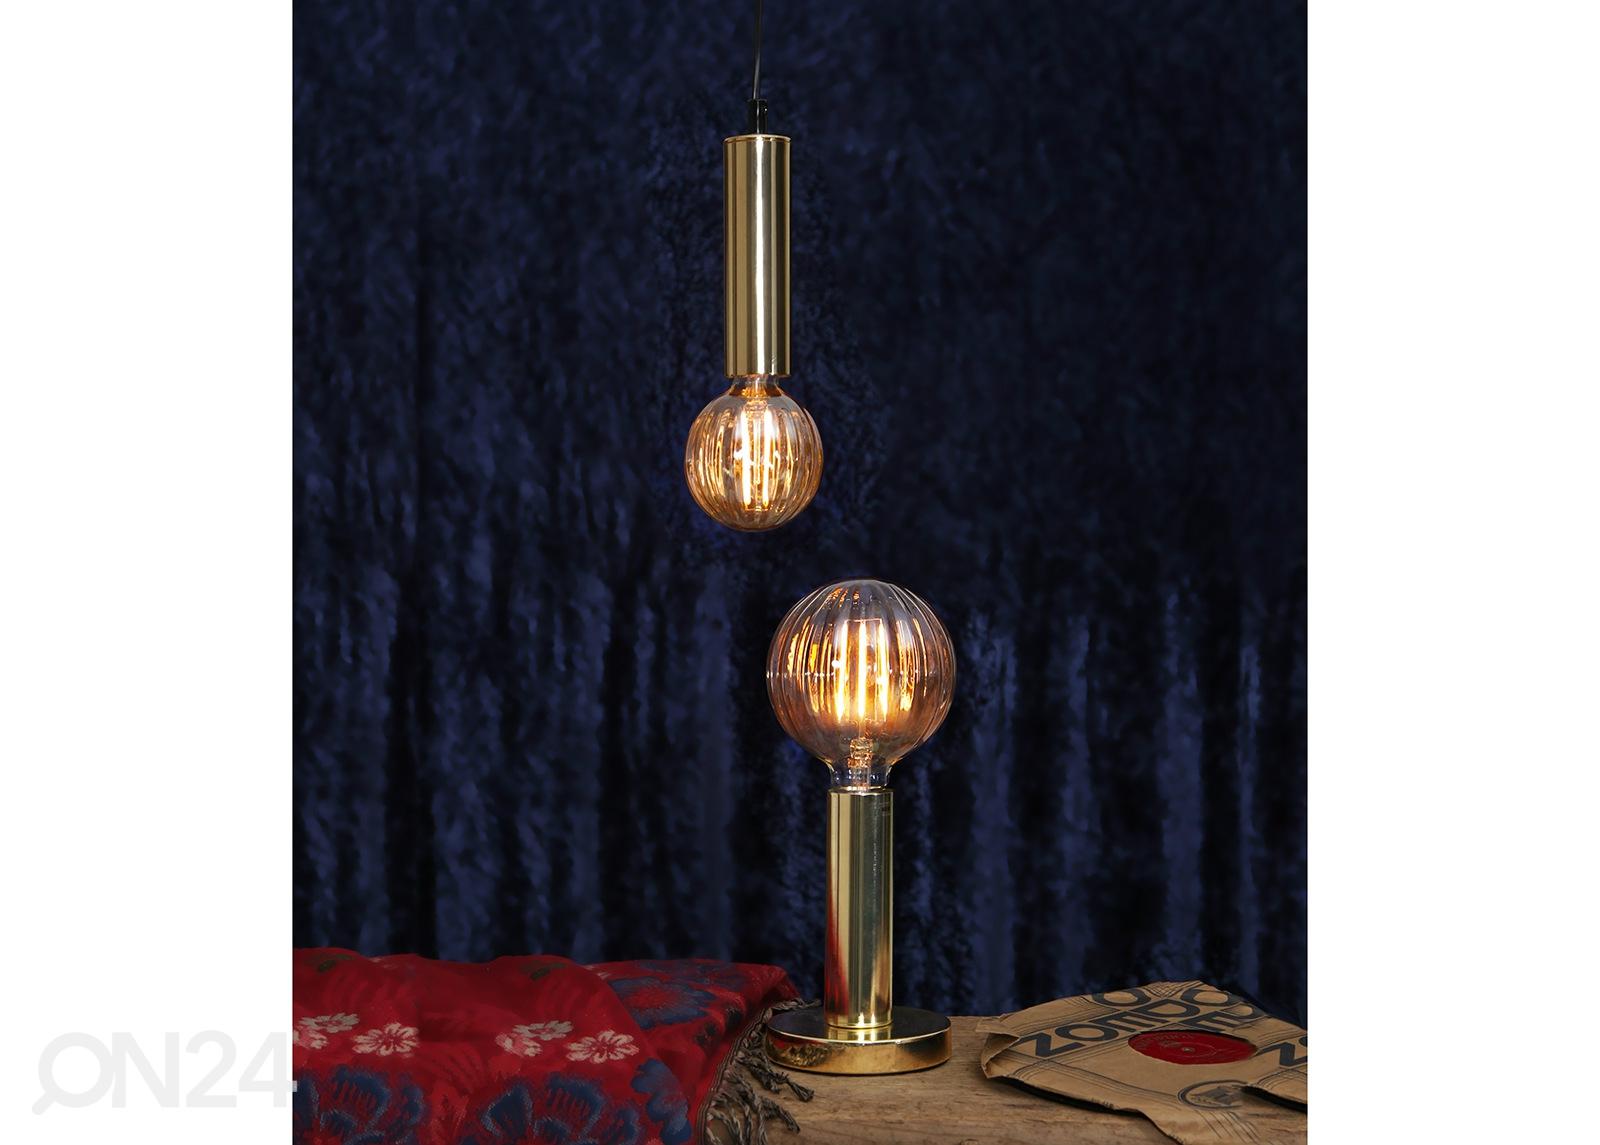 62d8858b04d Dekoratiivne LED pirn E27 2,5 W AA-152712 - ON24 Sisustuskaubamaja